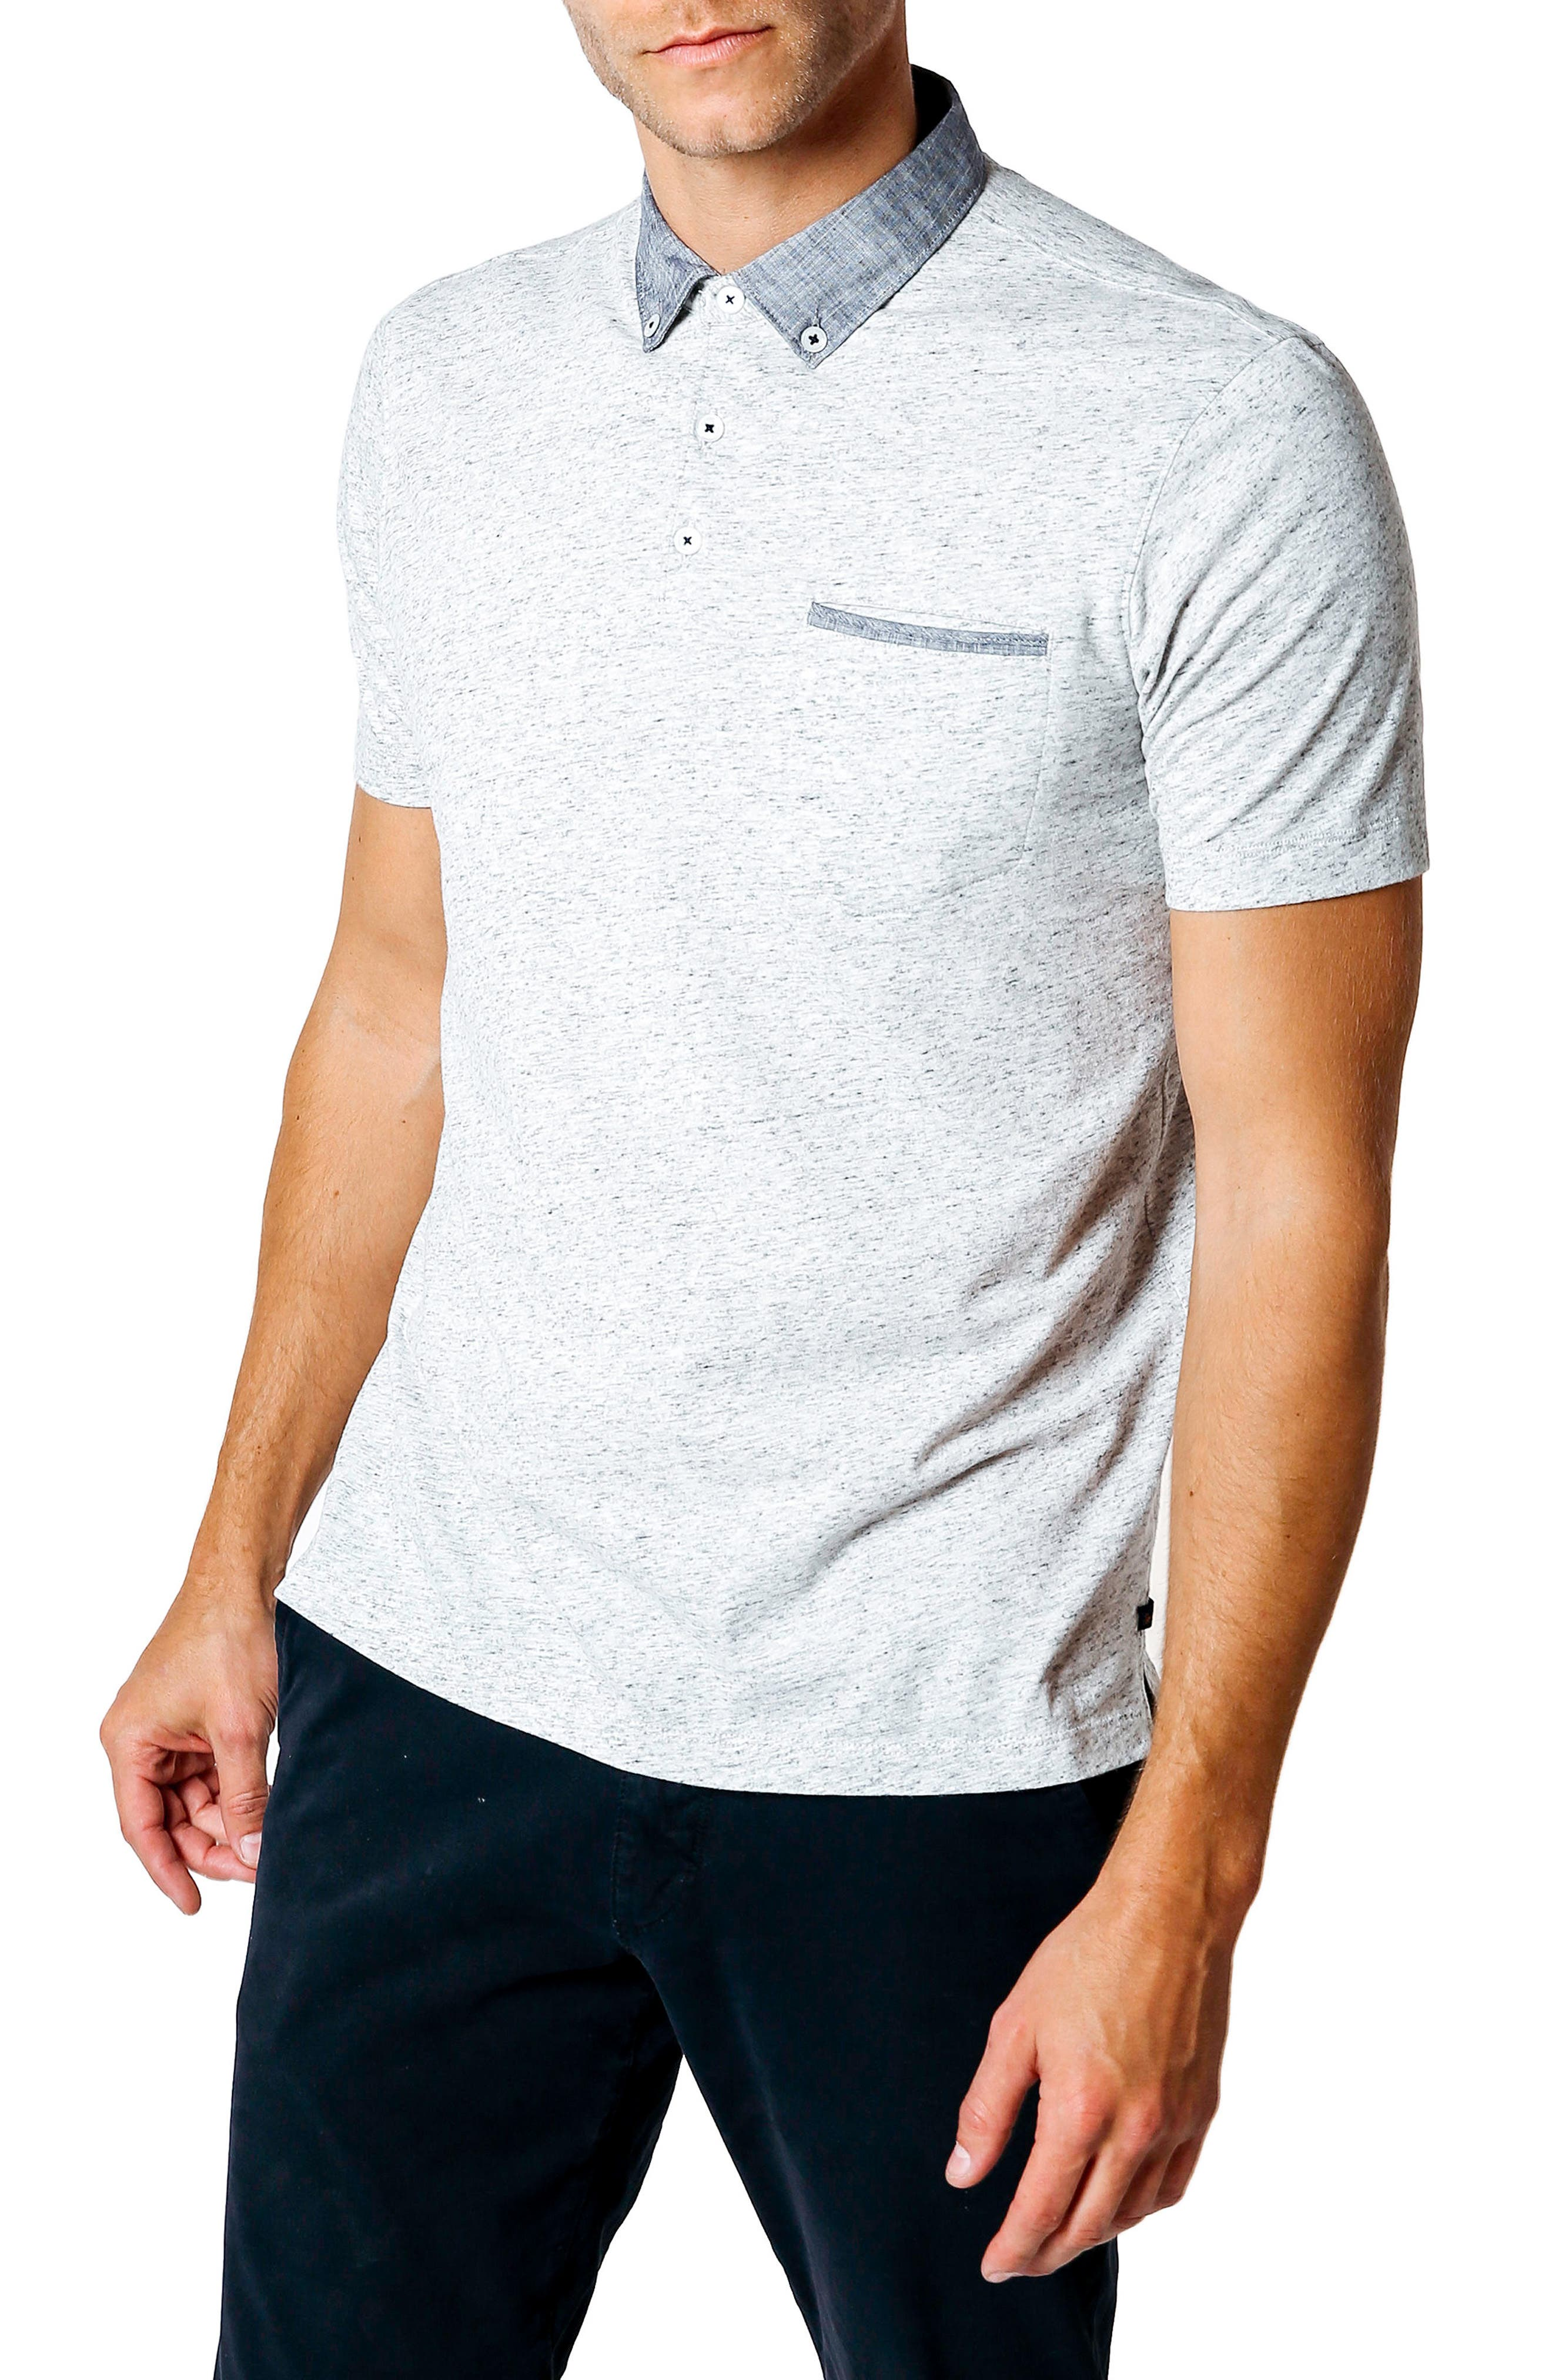 GOOD MAN BRAND Trim Fit Polo Shirt, Main, color, 030